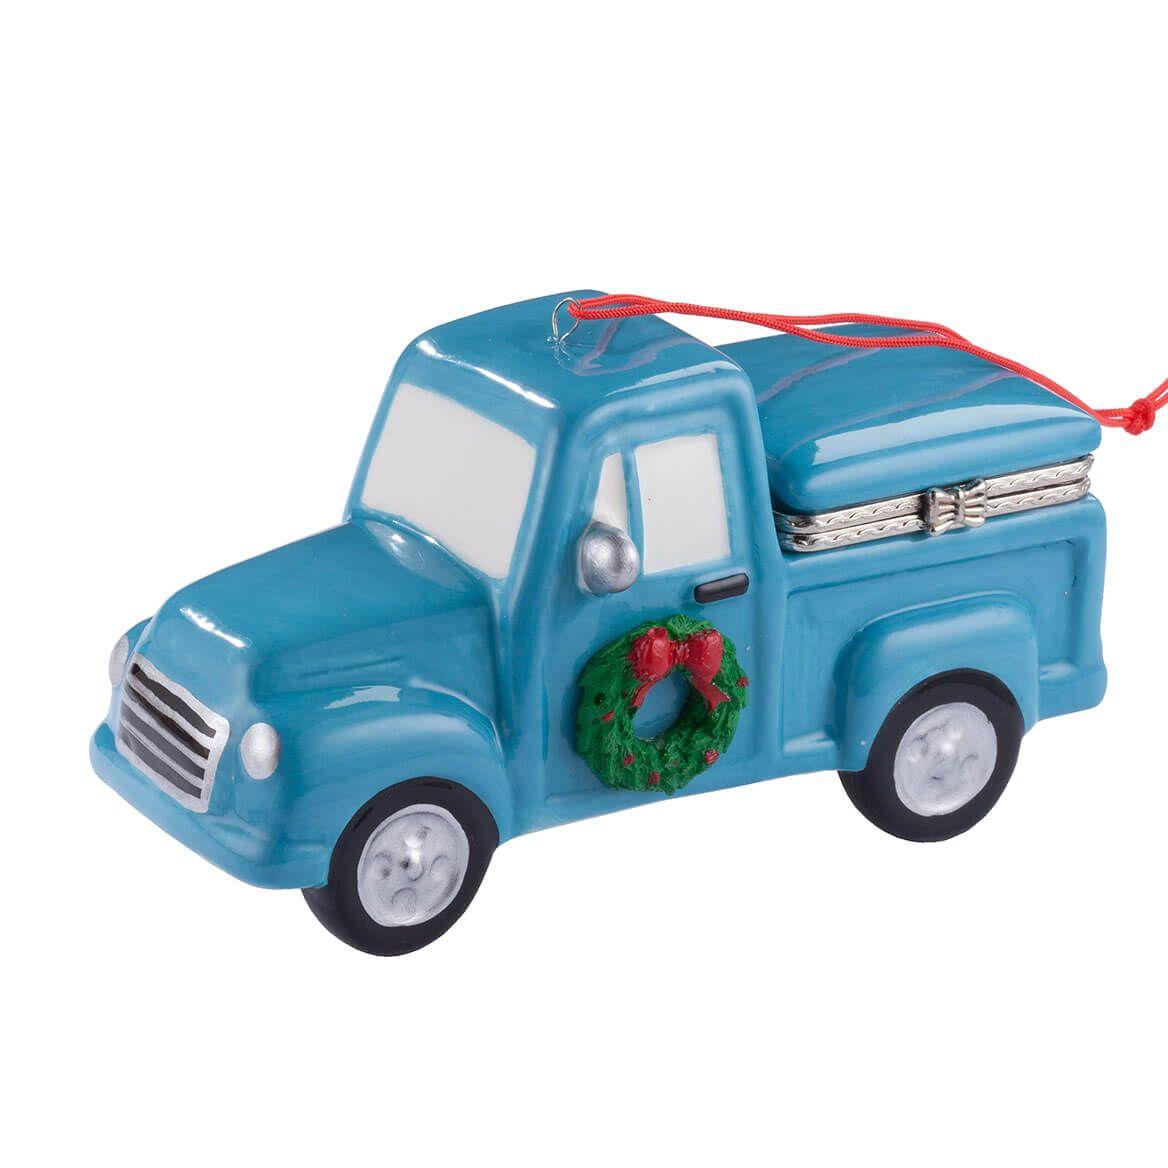 Vintage Truck with Tree Ornament Trinket Box-356327